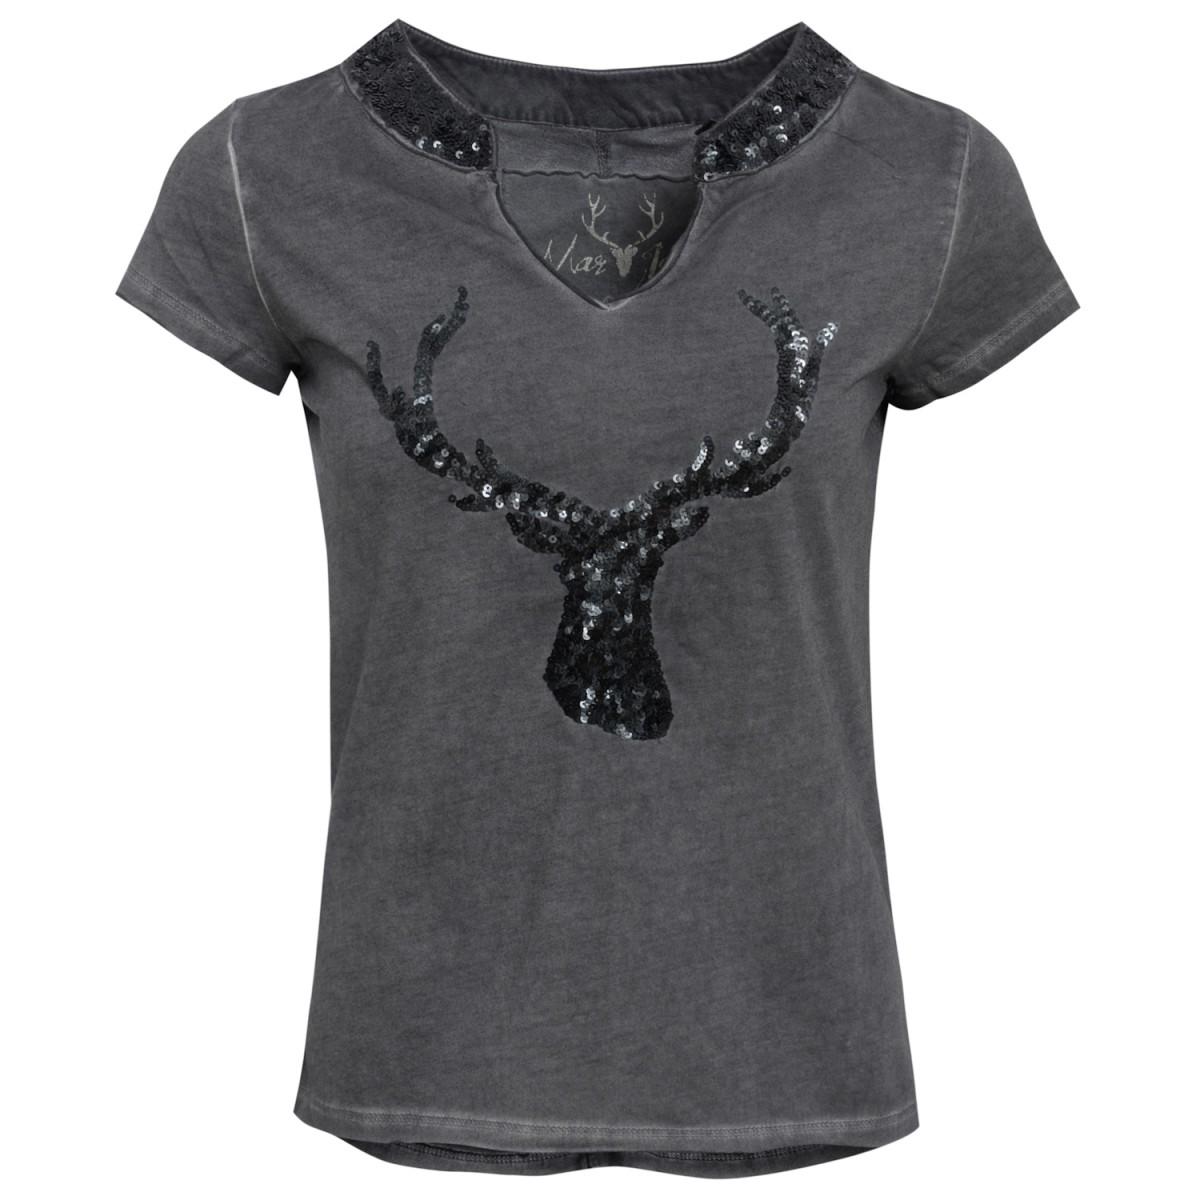 schwarzes Trachten T-Shirt